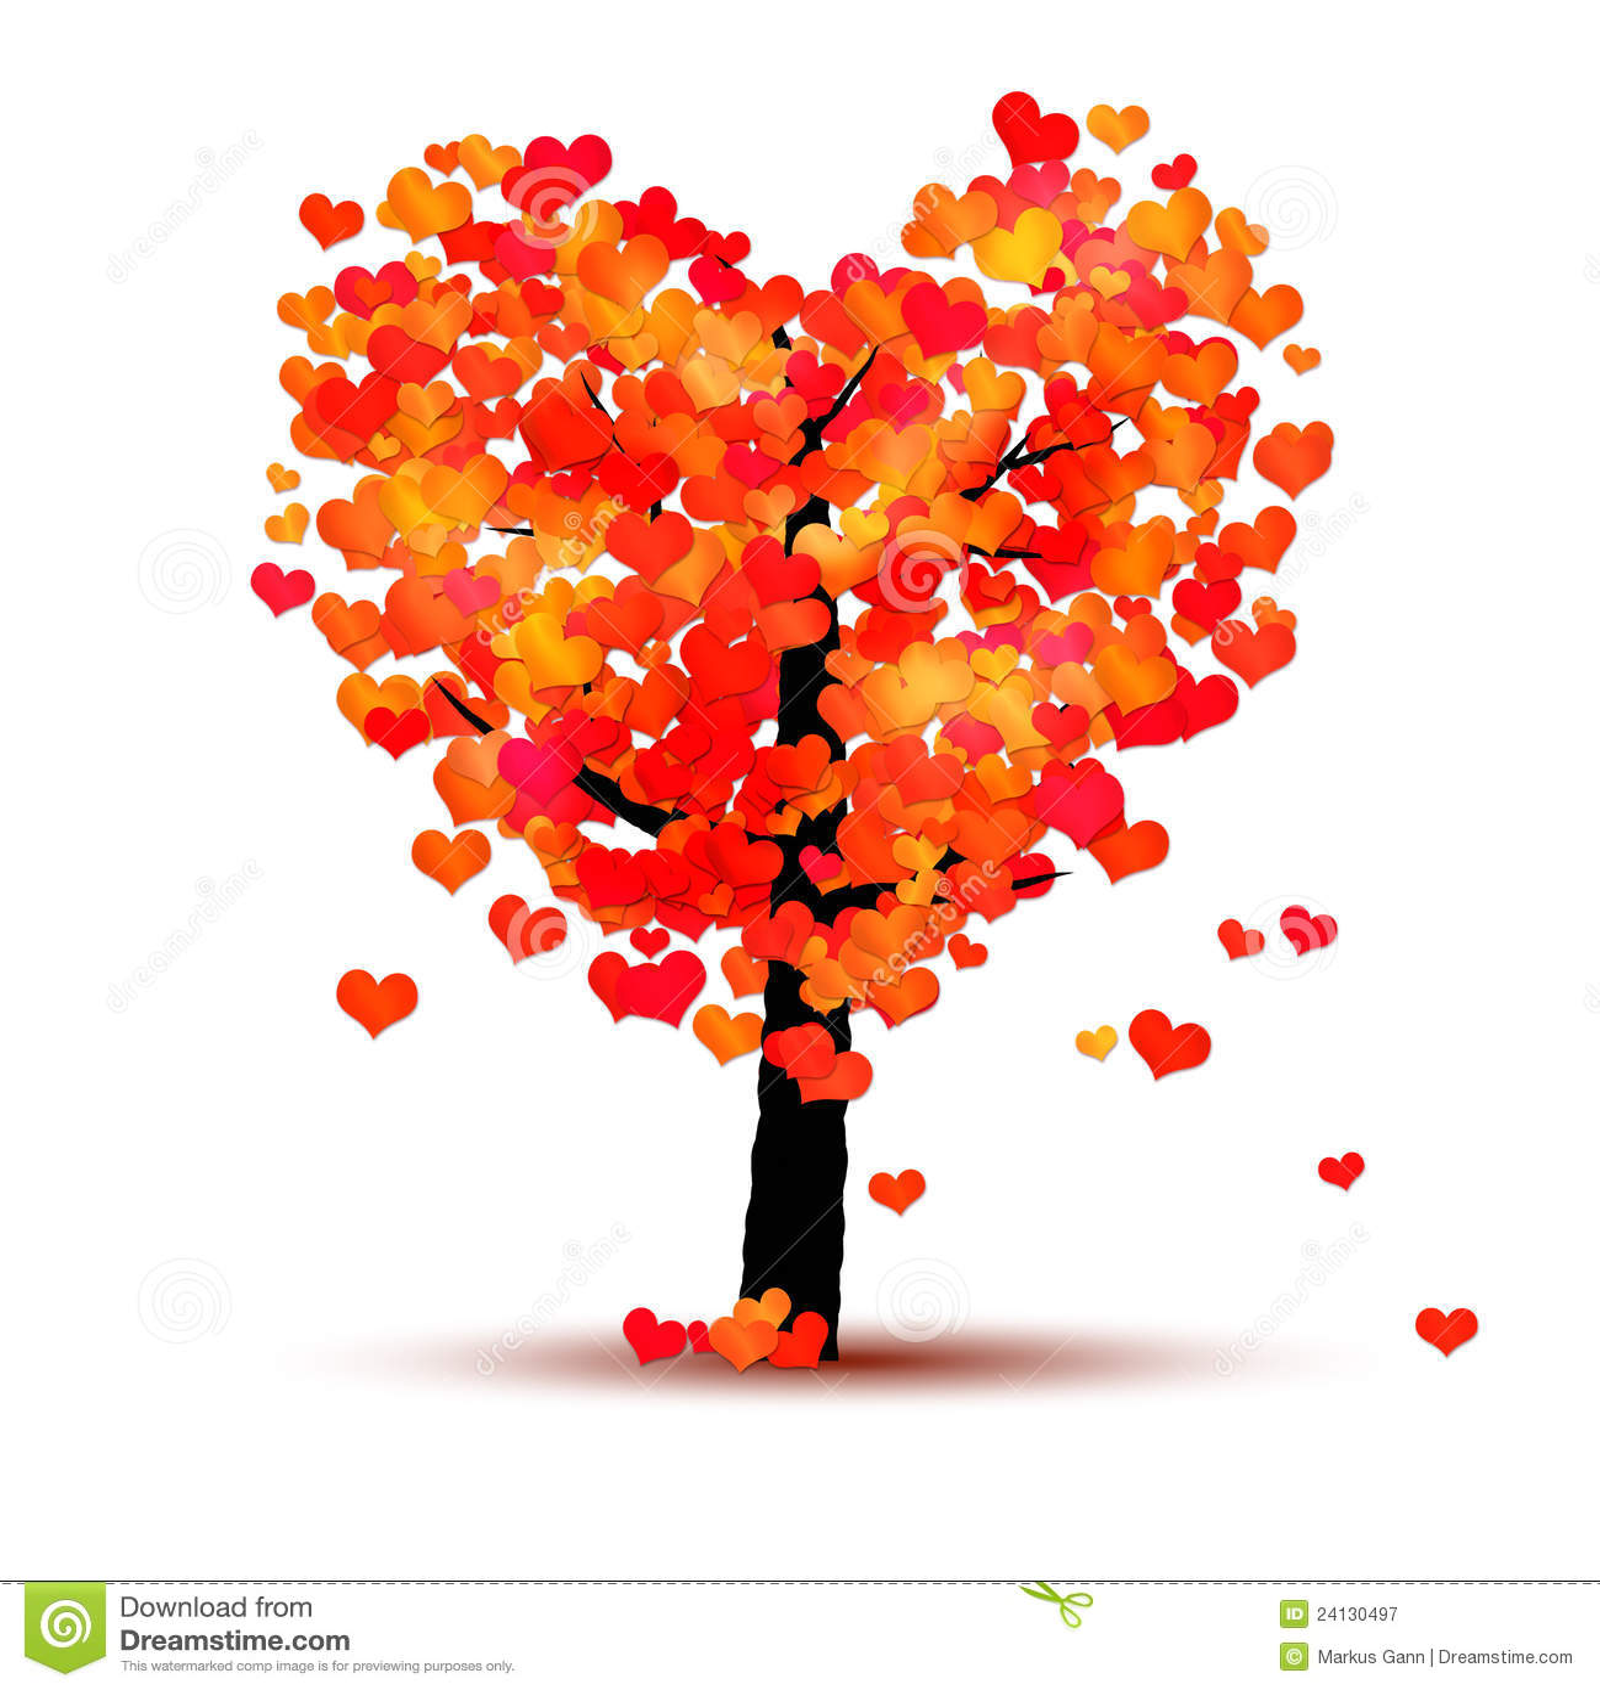 Heart tree stock illustration. Illustration of greeting ...